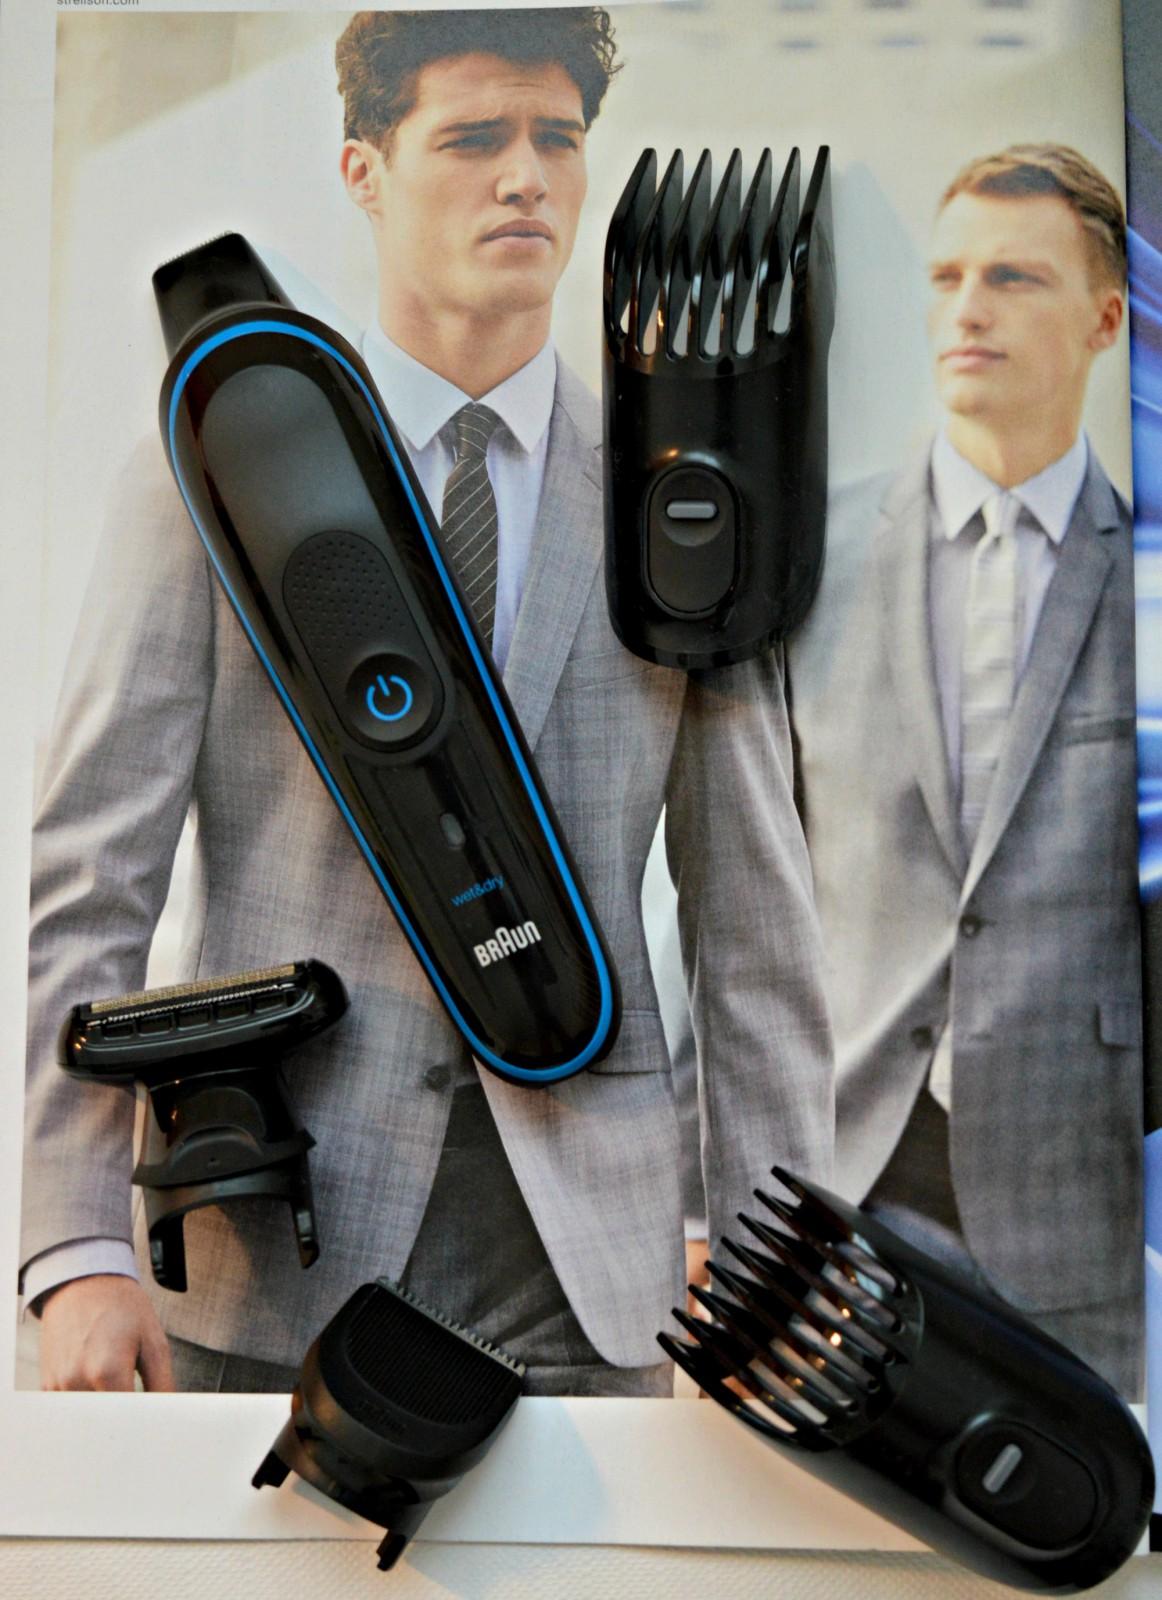 Braun multi grooming set